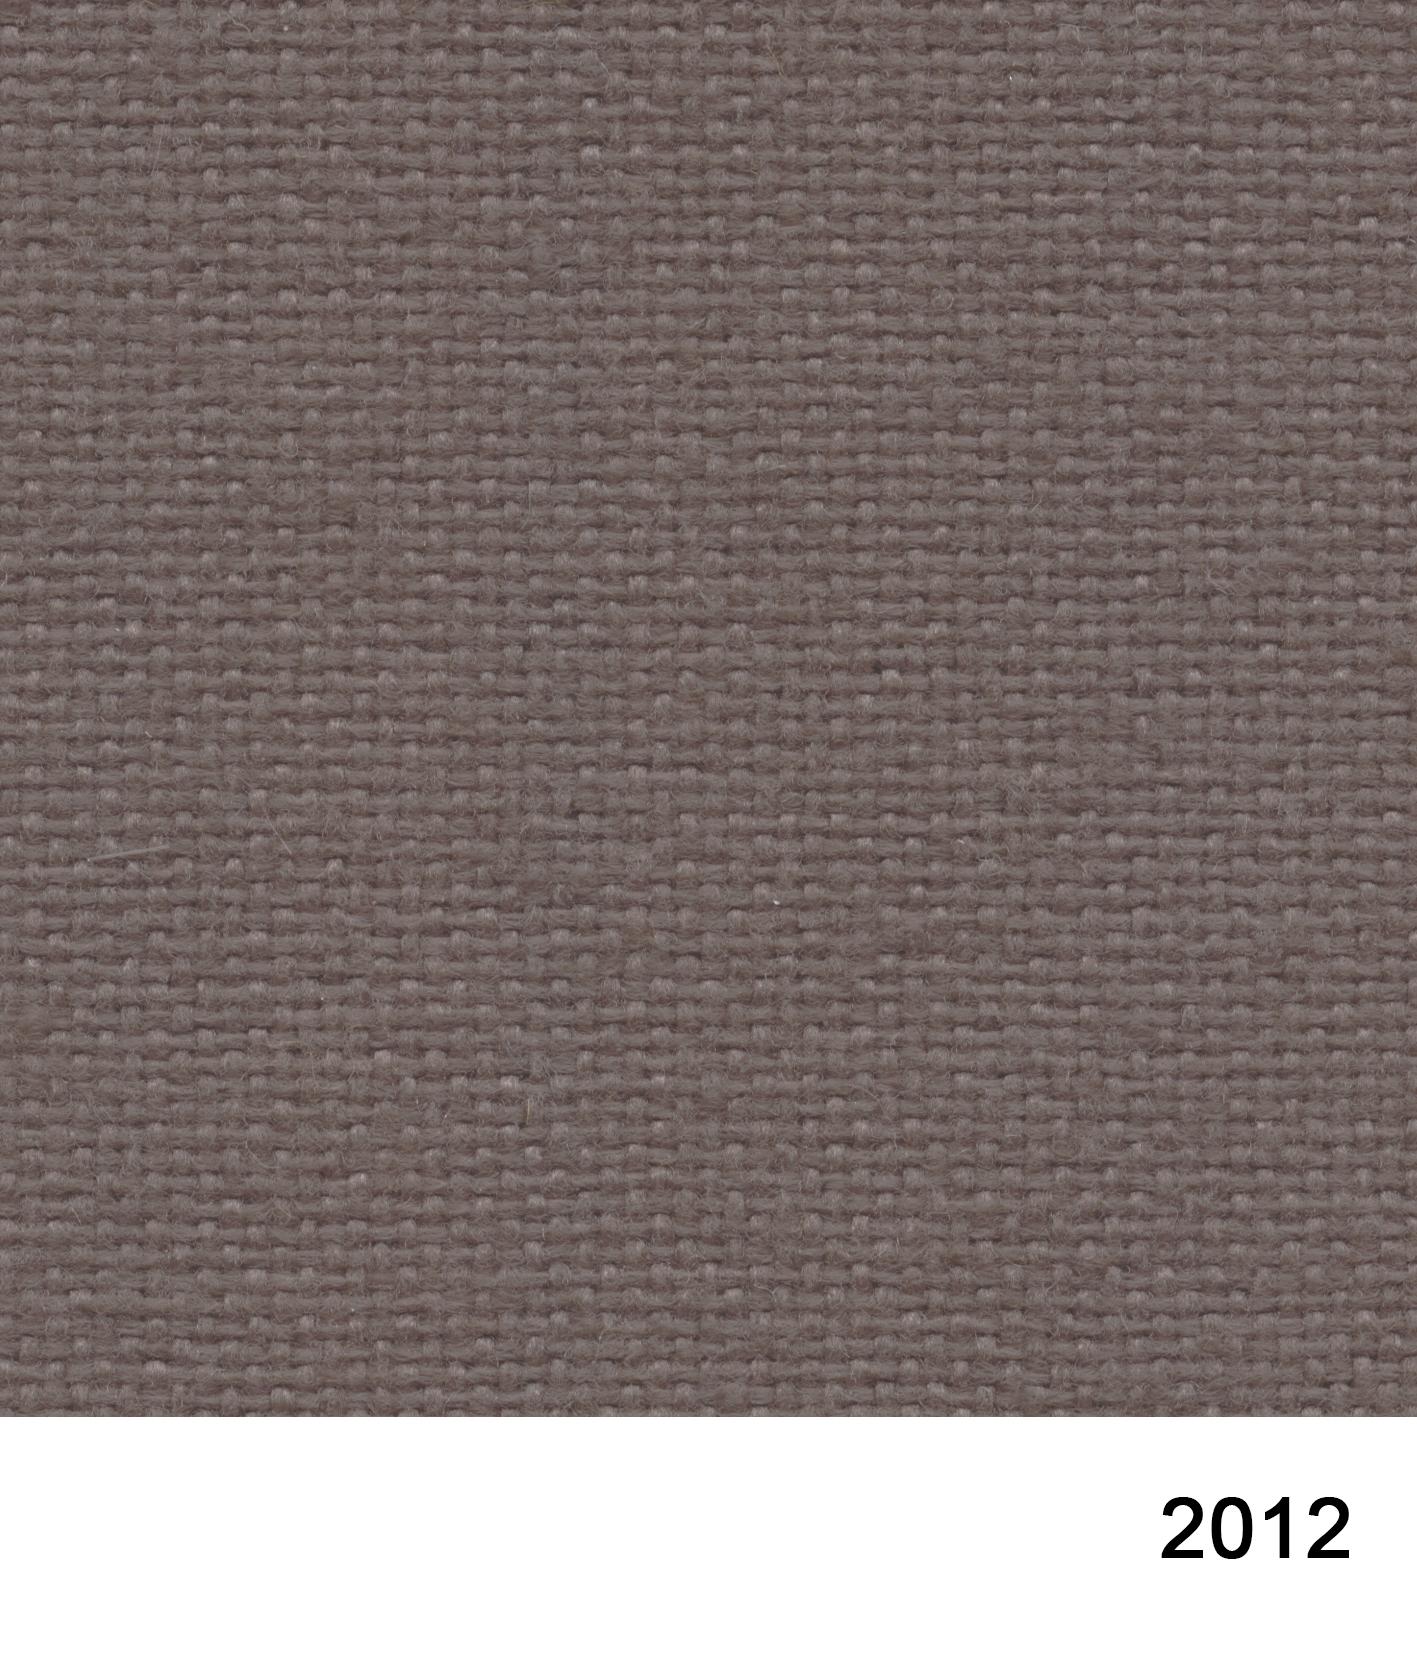 JET BIOACTIVE 3153